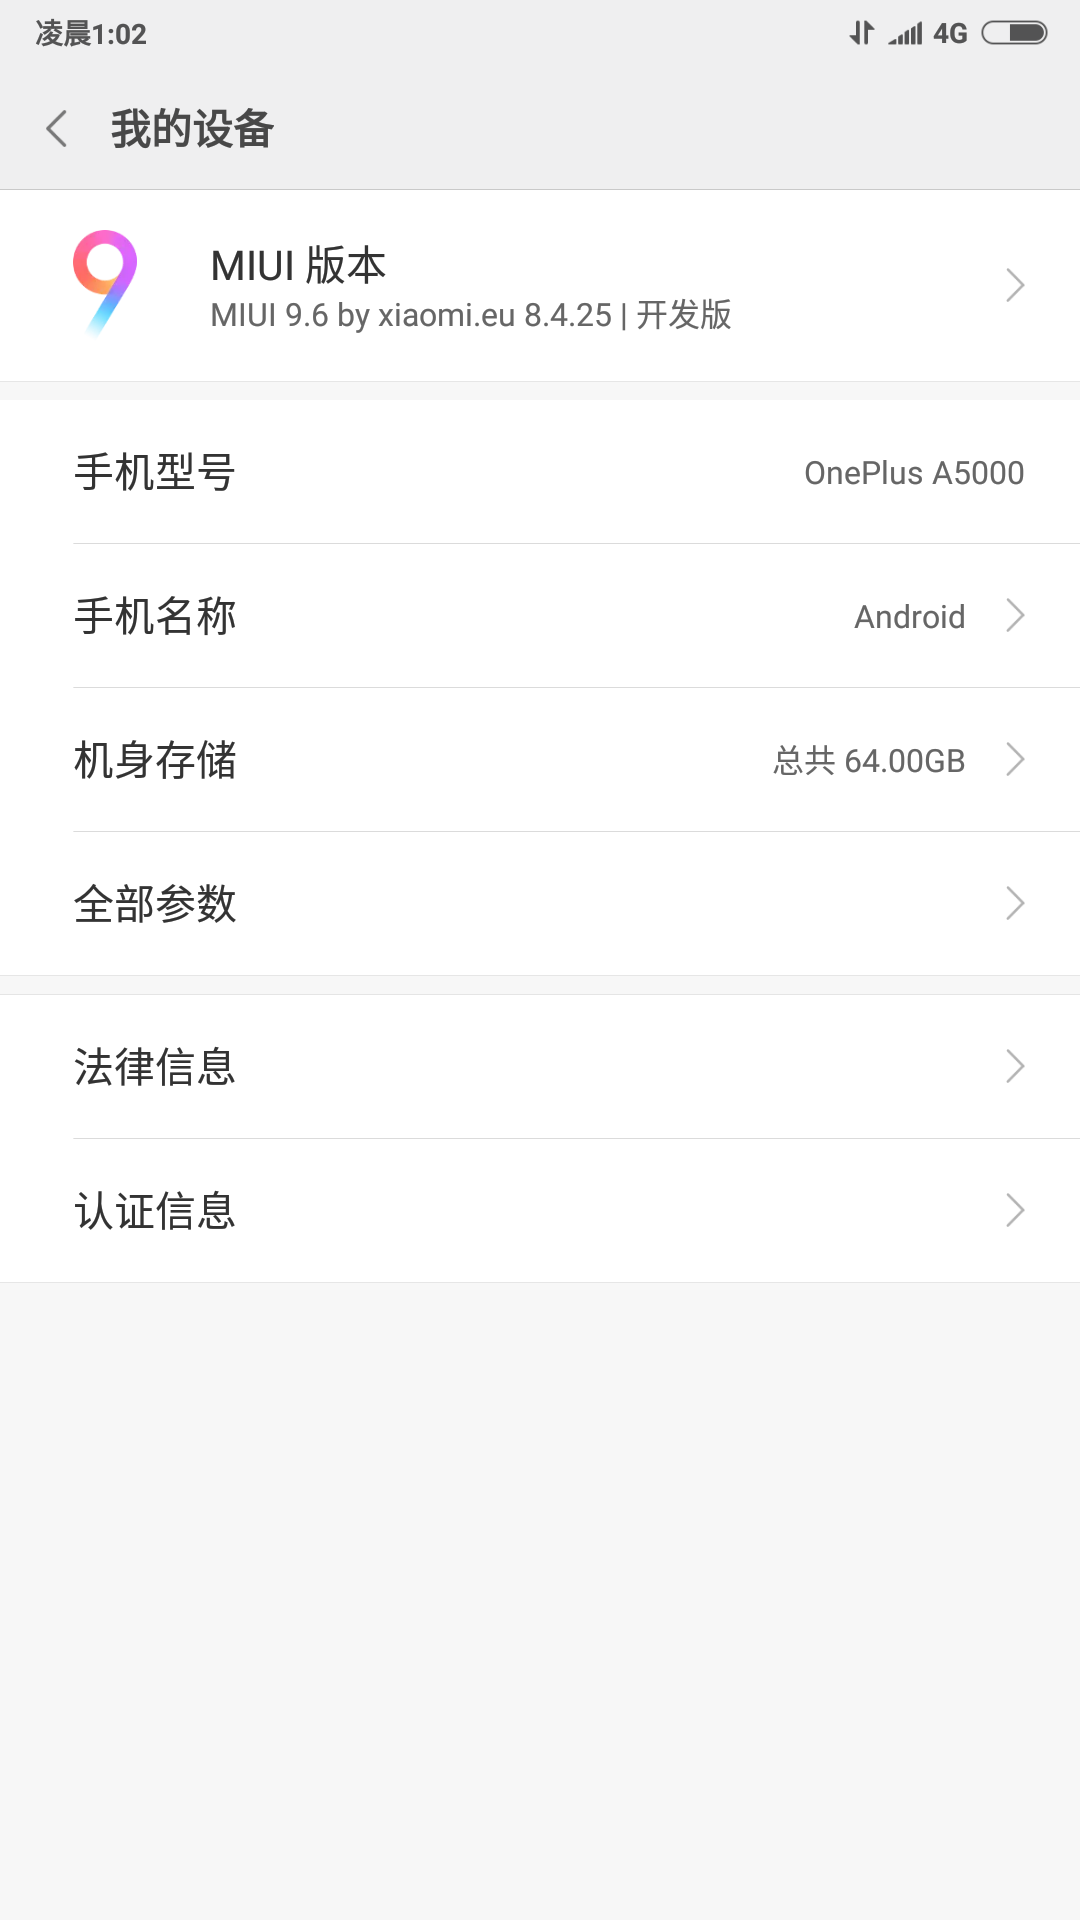 Screenshot_2018-04-26-01-02-34-586_com.android.settings.png